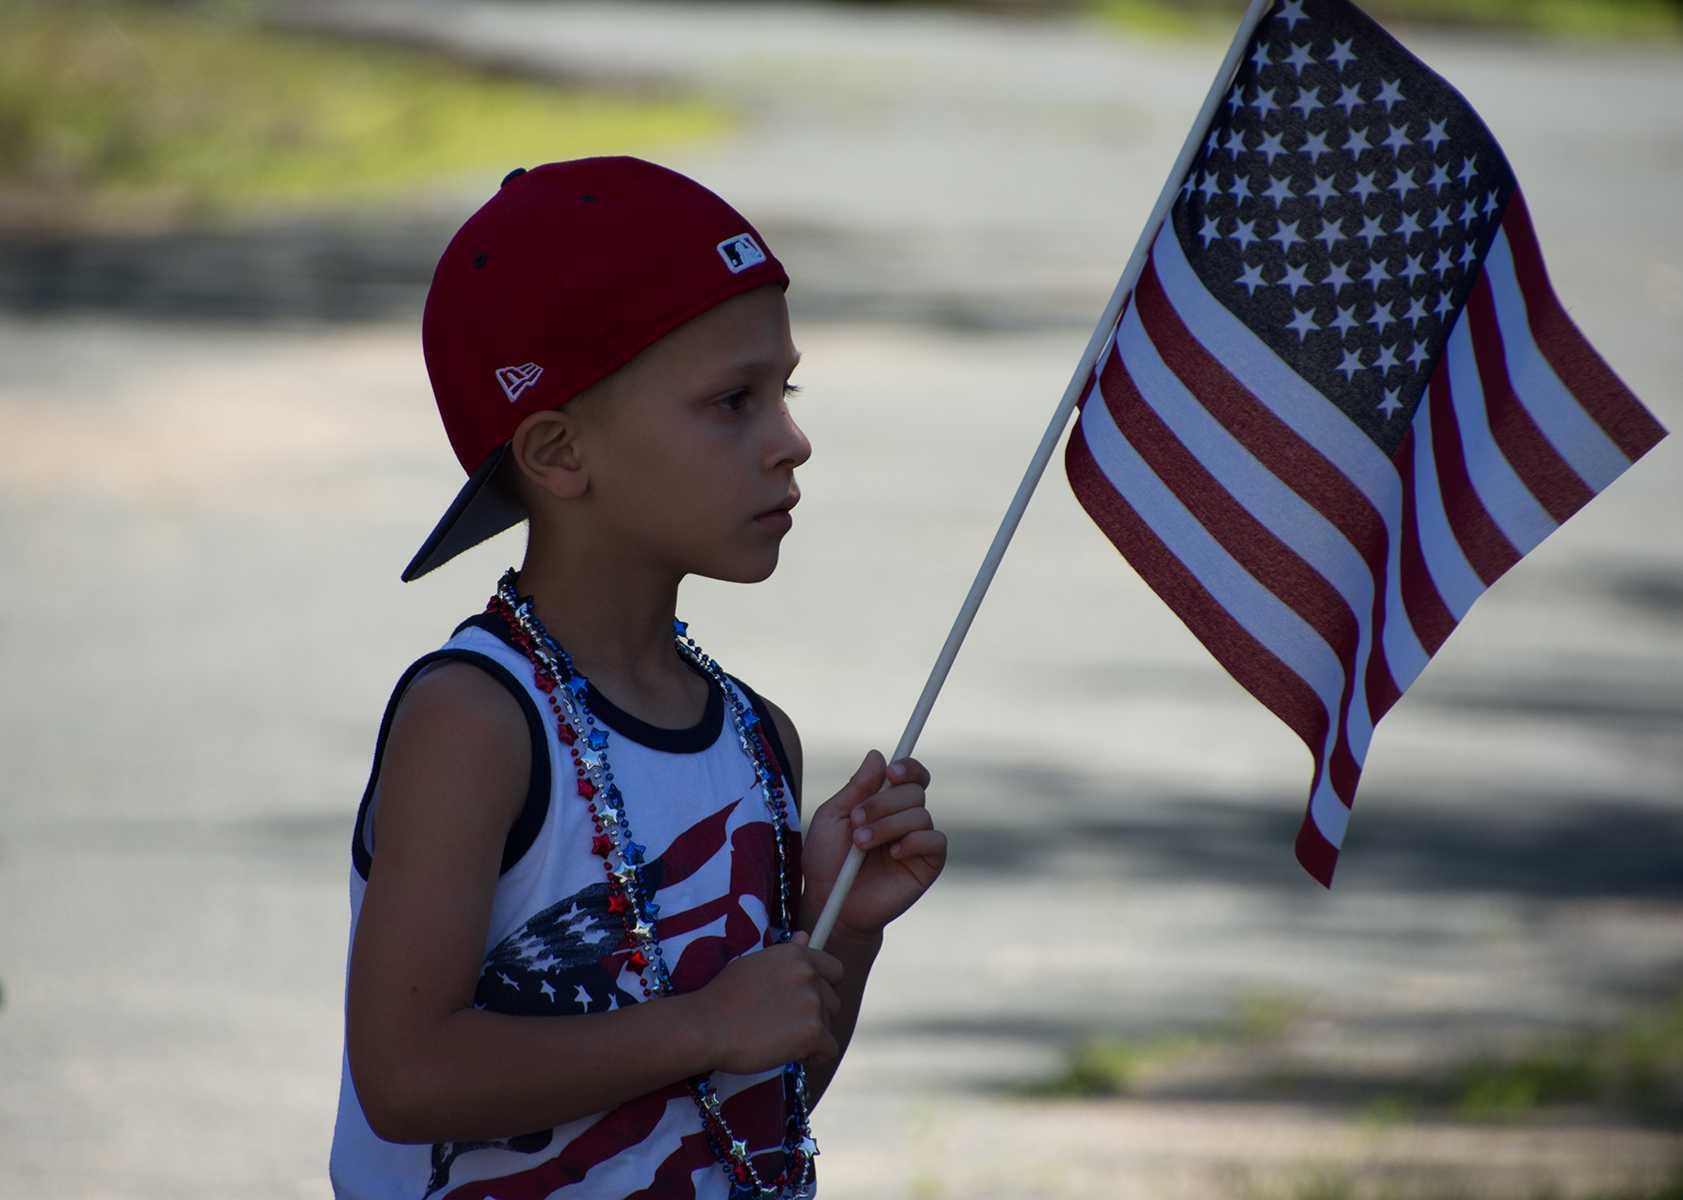 Boxford July 4th parade 2017